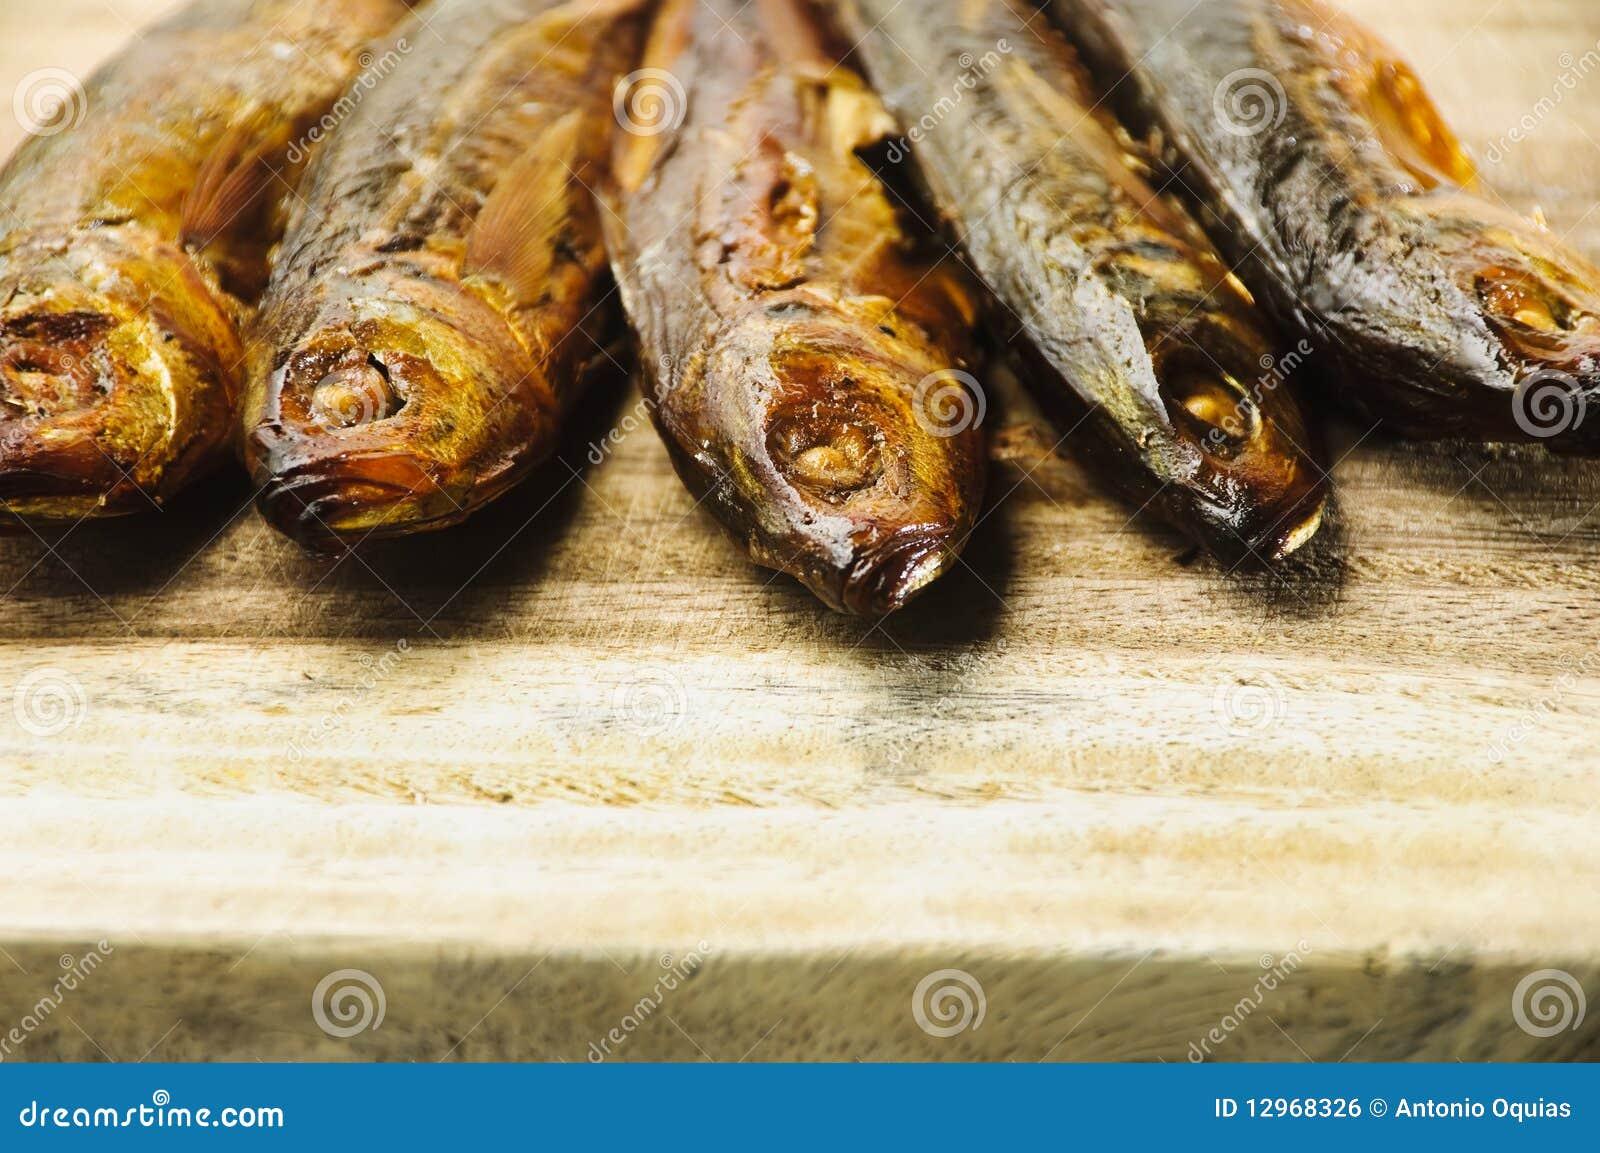 Smoked fish royalty free stock image image 12968326 for Cold smoking fish